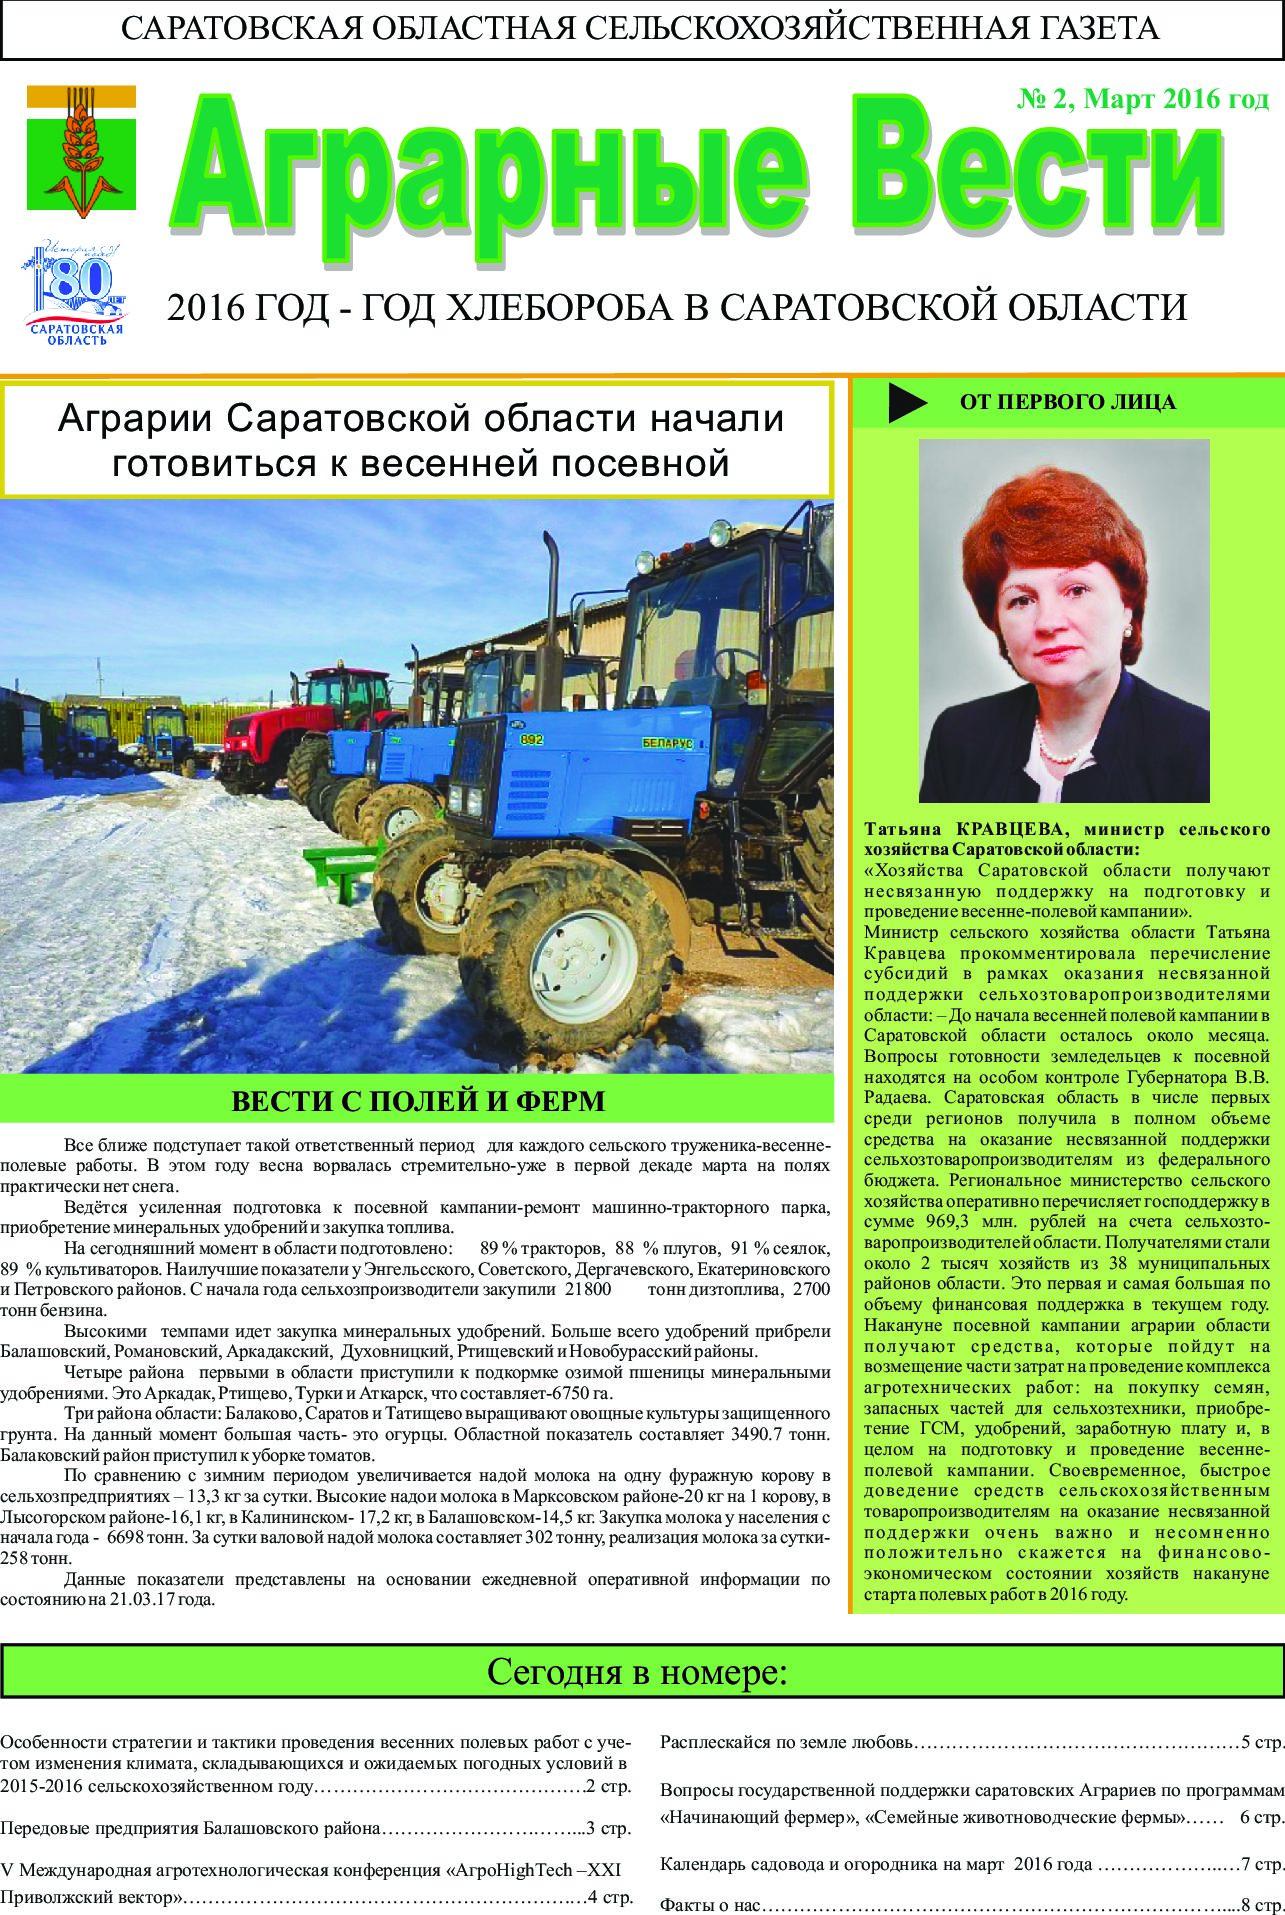 https://saratovagro.ru/wp-content/uploads/2020/08/март-pdf.jpg